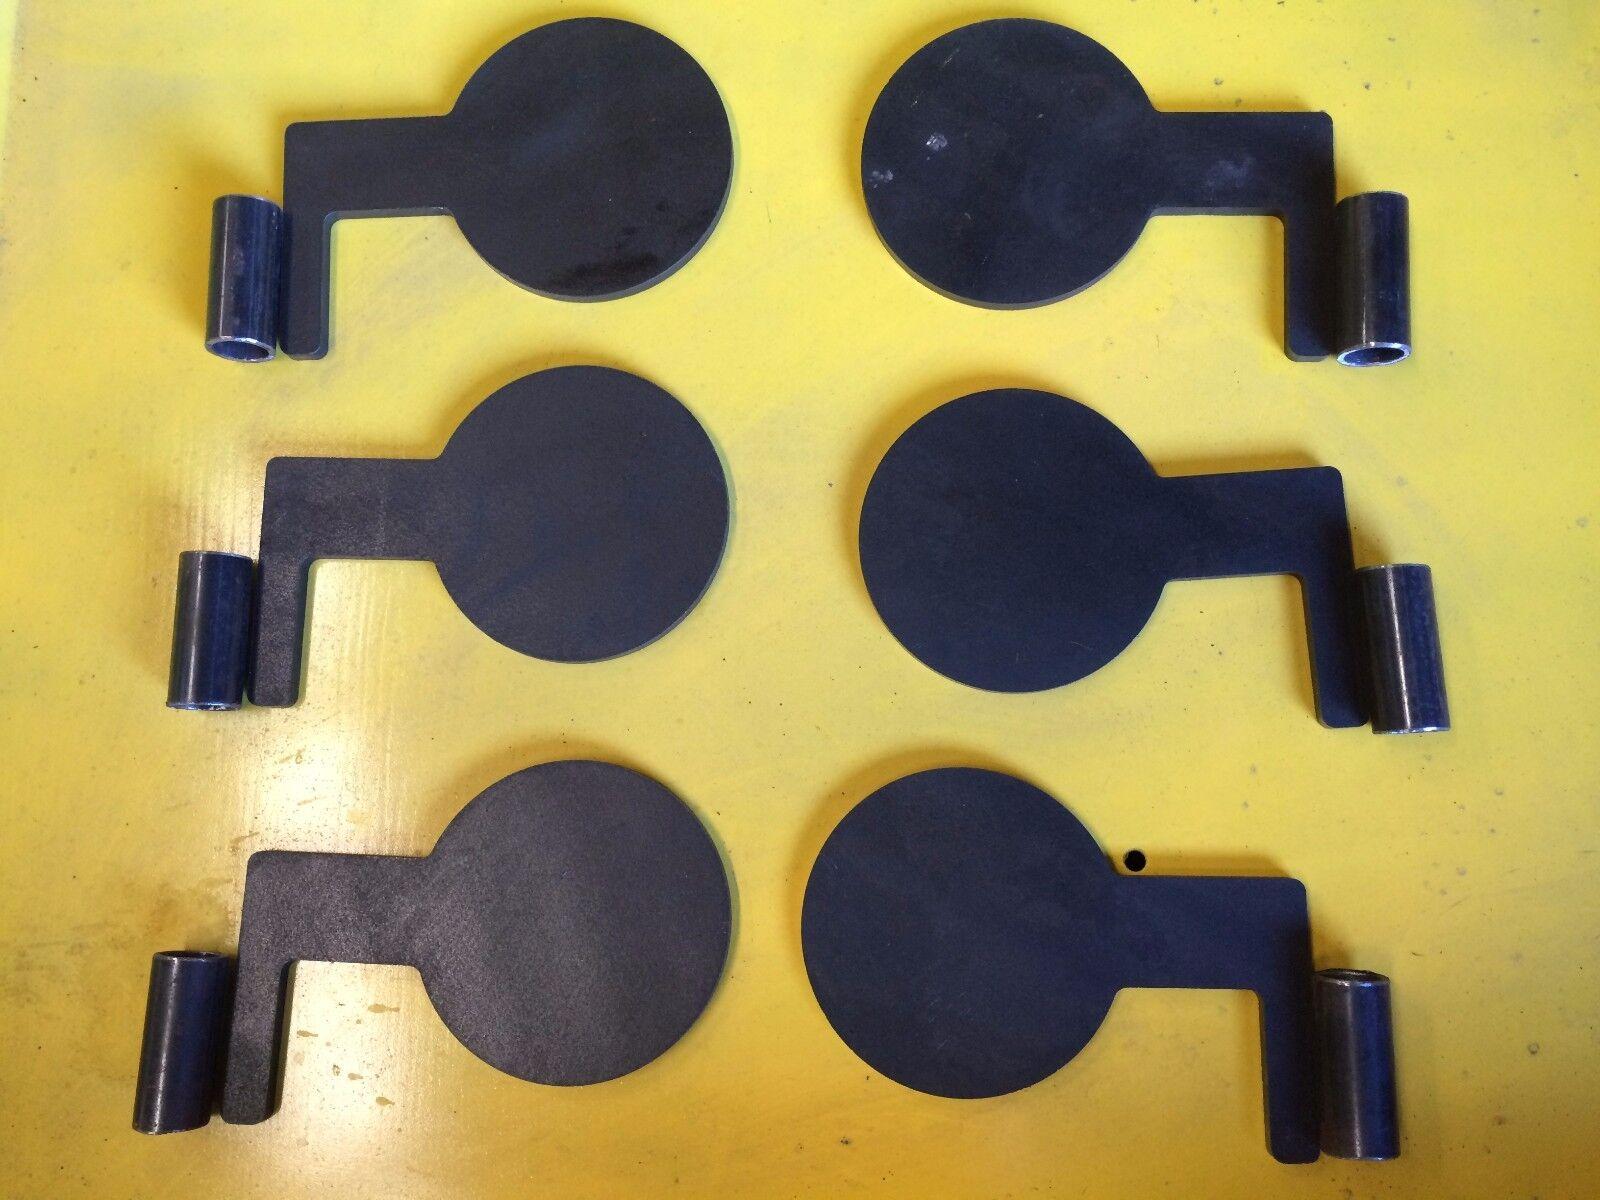 Duel Arbre Pad 3 8  X 3  Jambe X 7 8 leg largeur x 5  diam AR500 set 6 pcs avec tuyaux